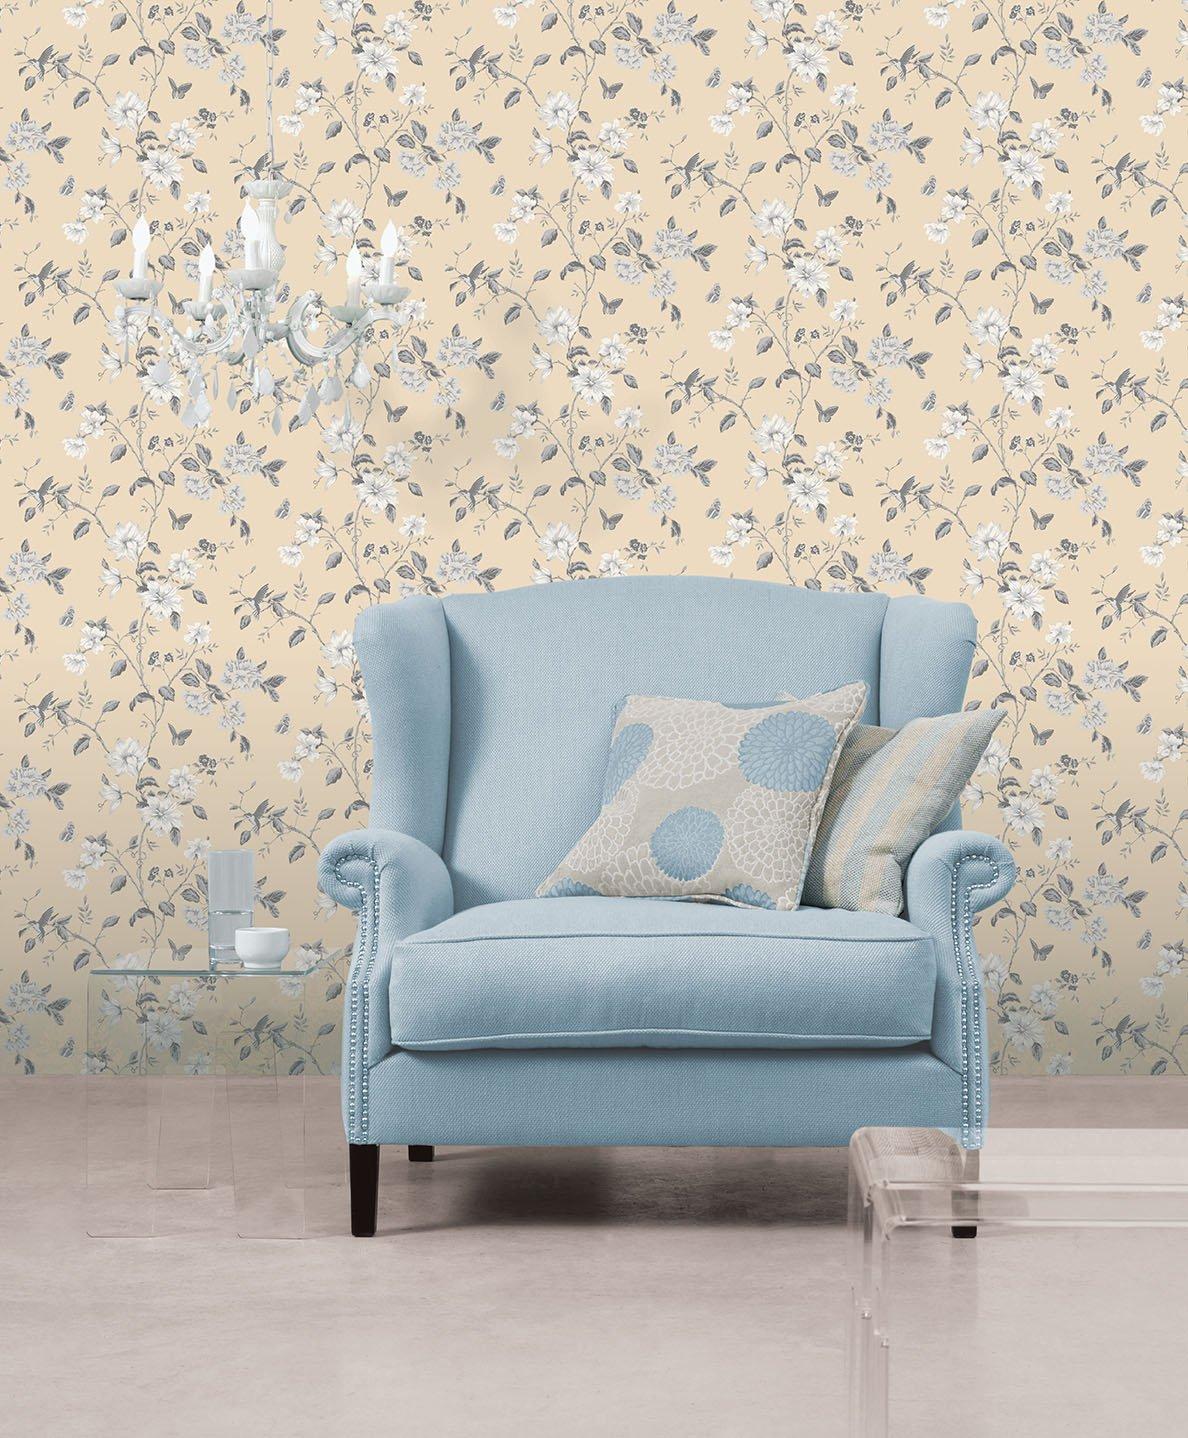 G34305 English Florals Floral Beige /& Grey Galerie Wallpaper